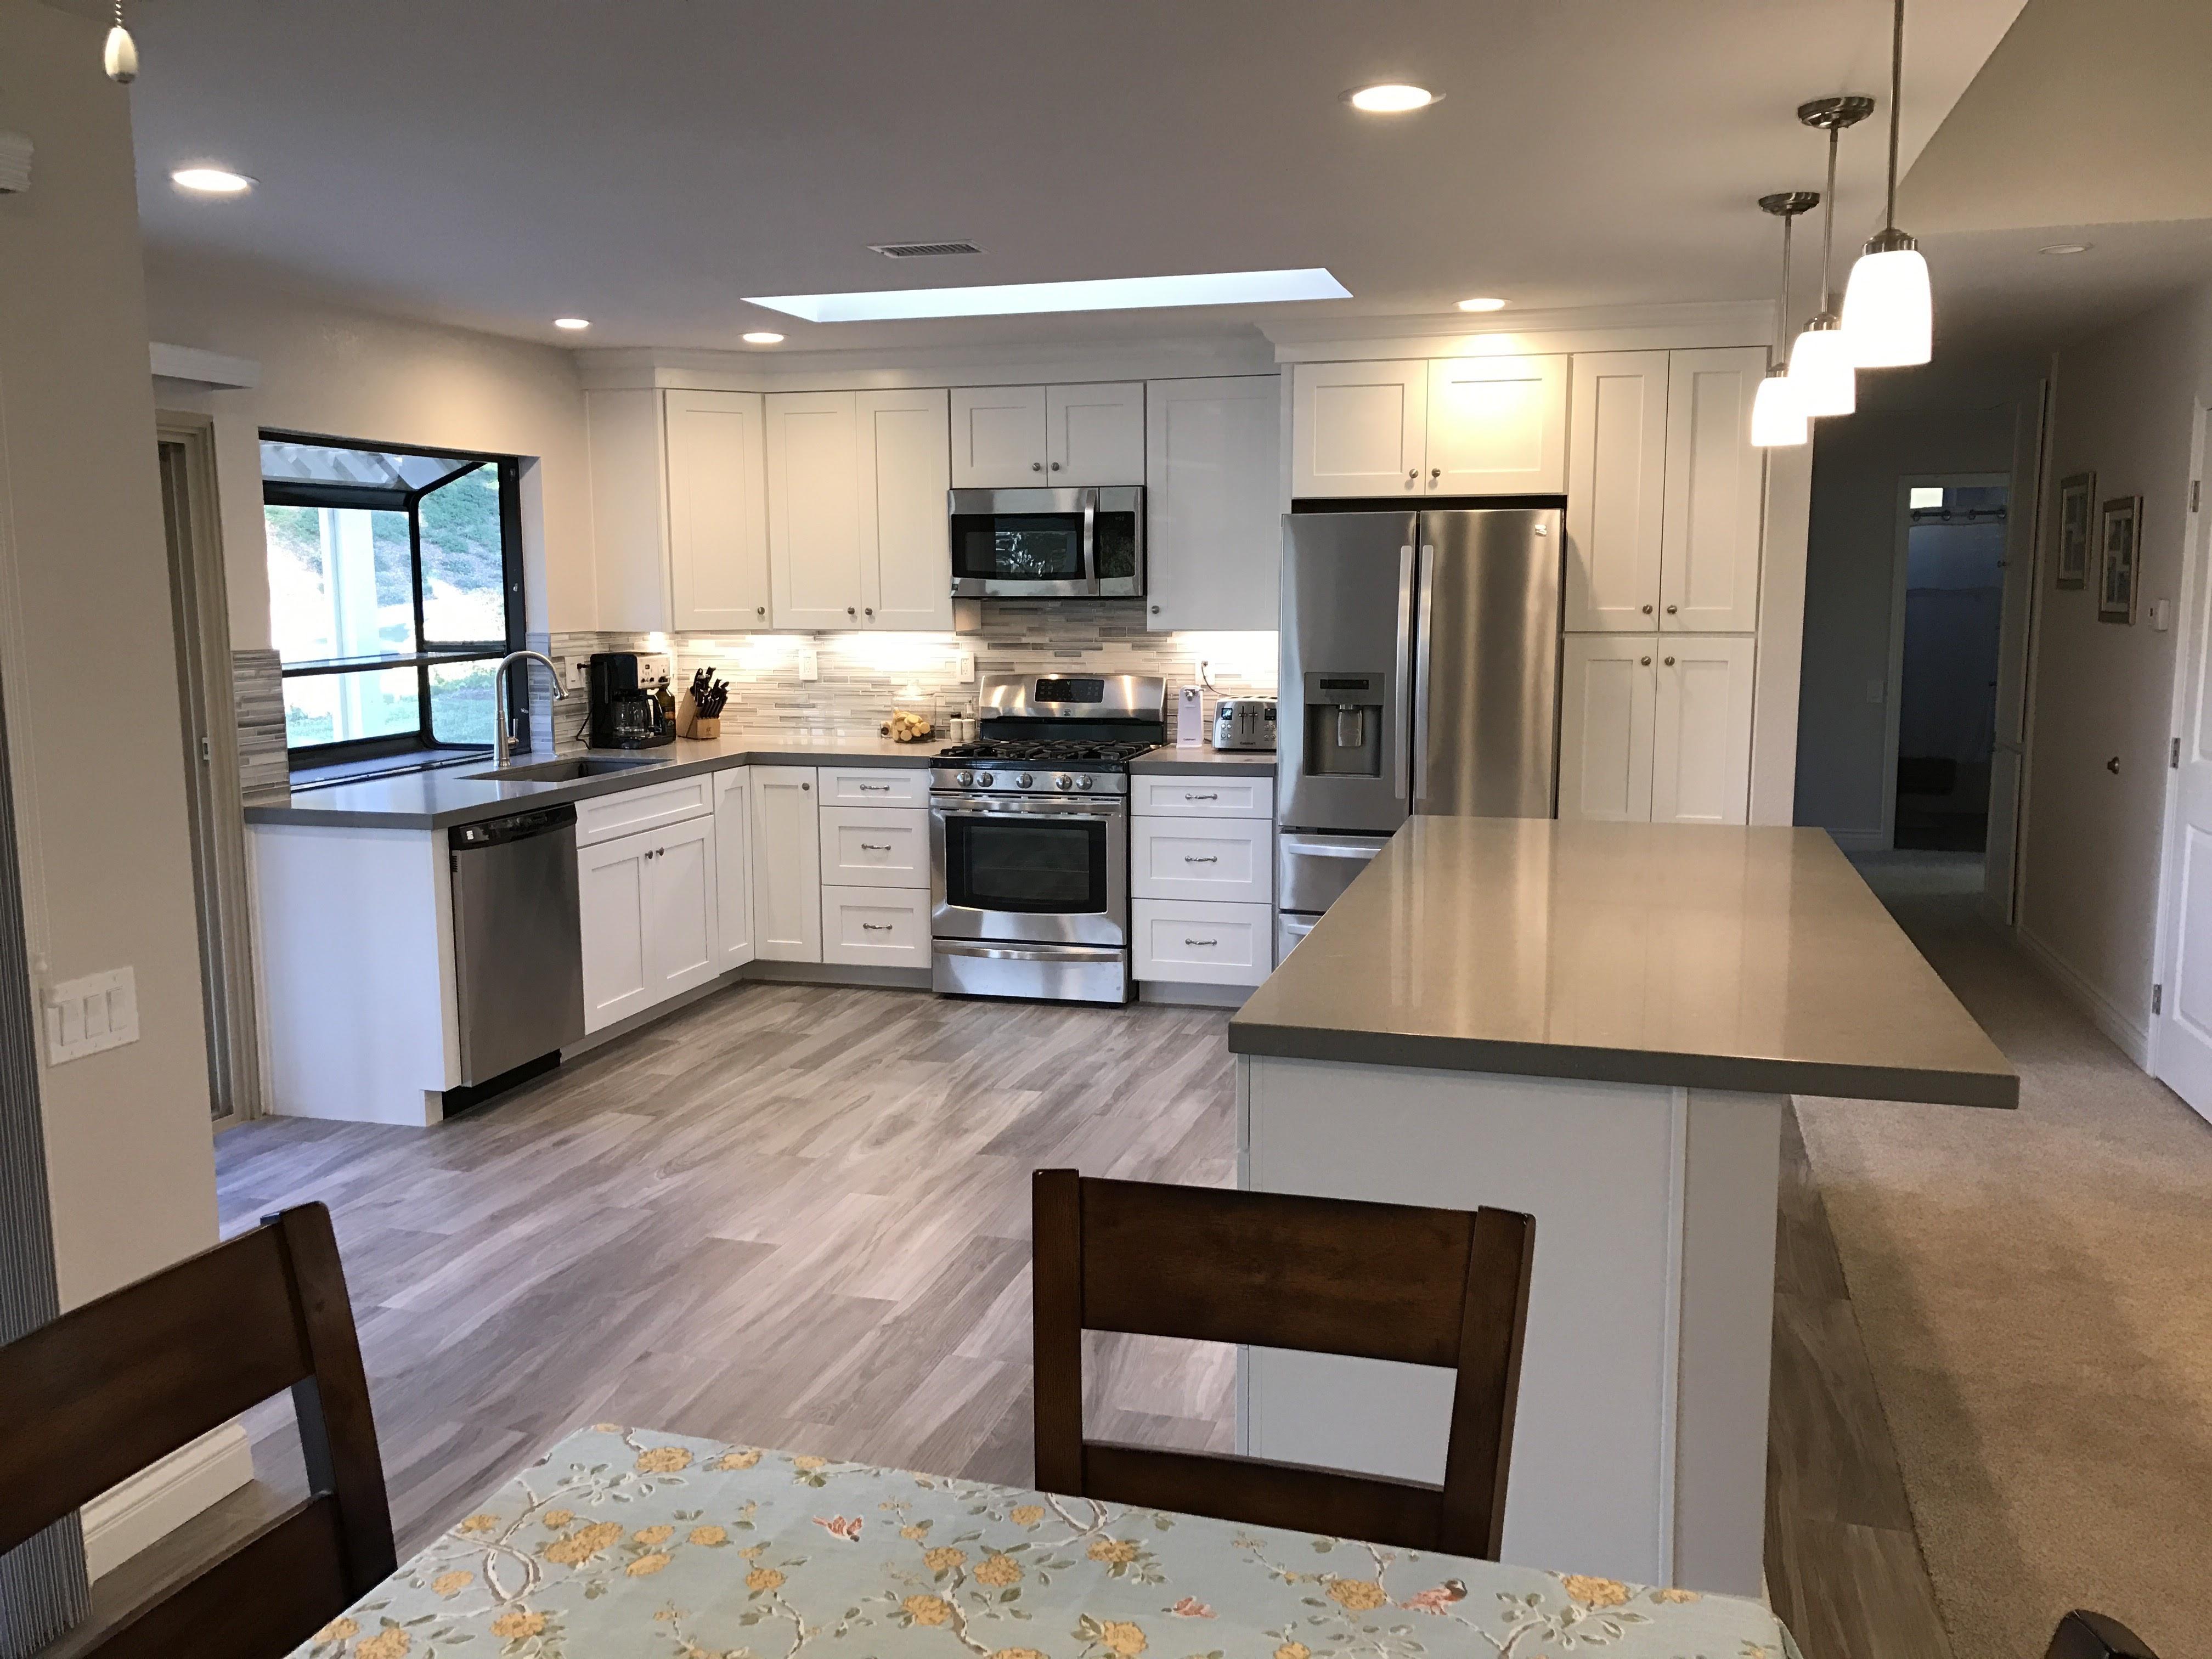 Kitchen Renovation Company Explains Laminate & Luxury Vinyl ...